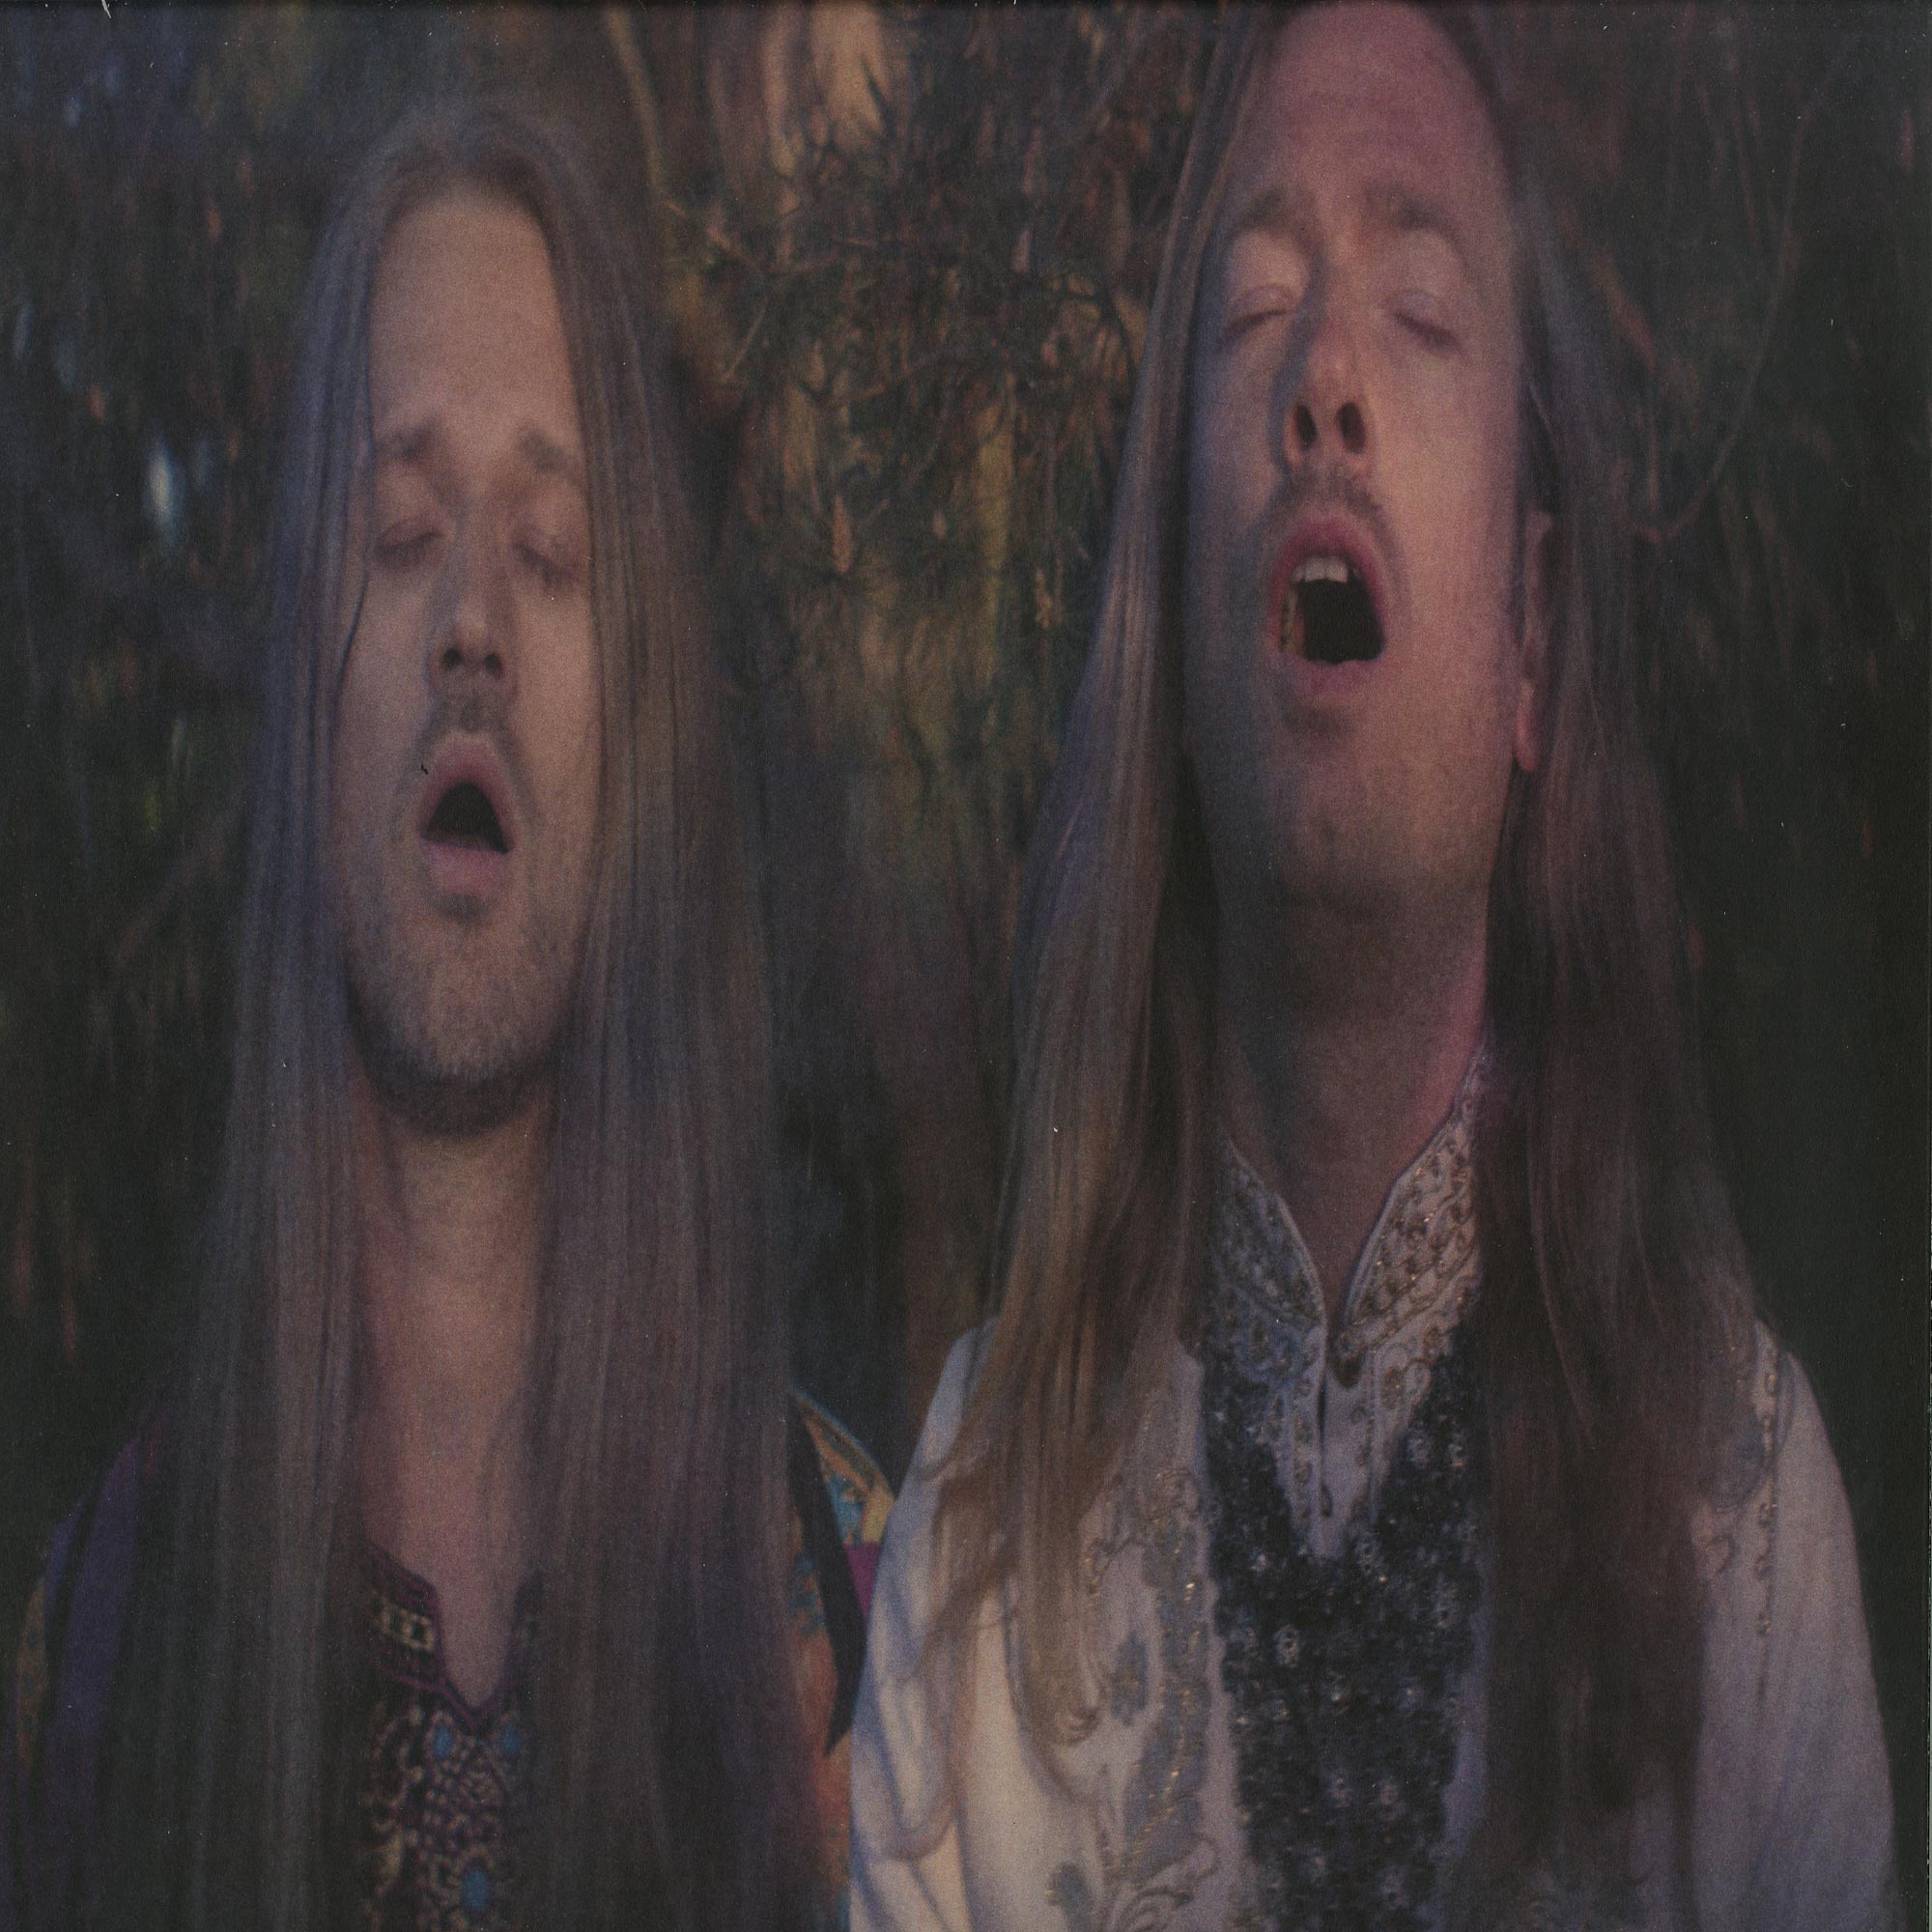 Thunder Tillman - NIGHTSCHOOL OF UNIVERSAL WISDOM